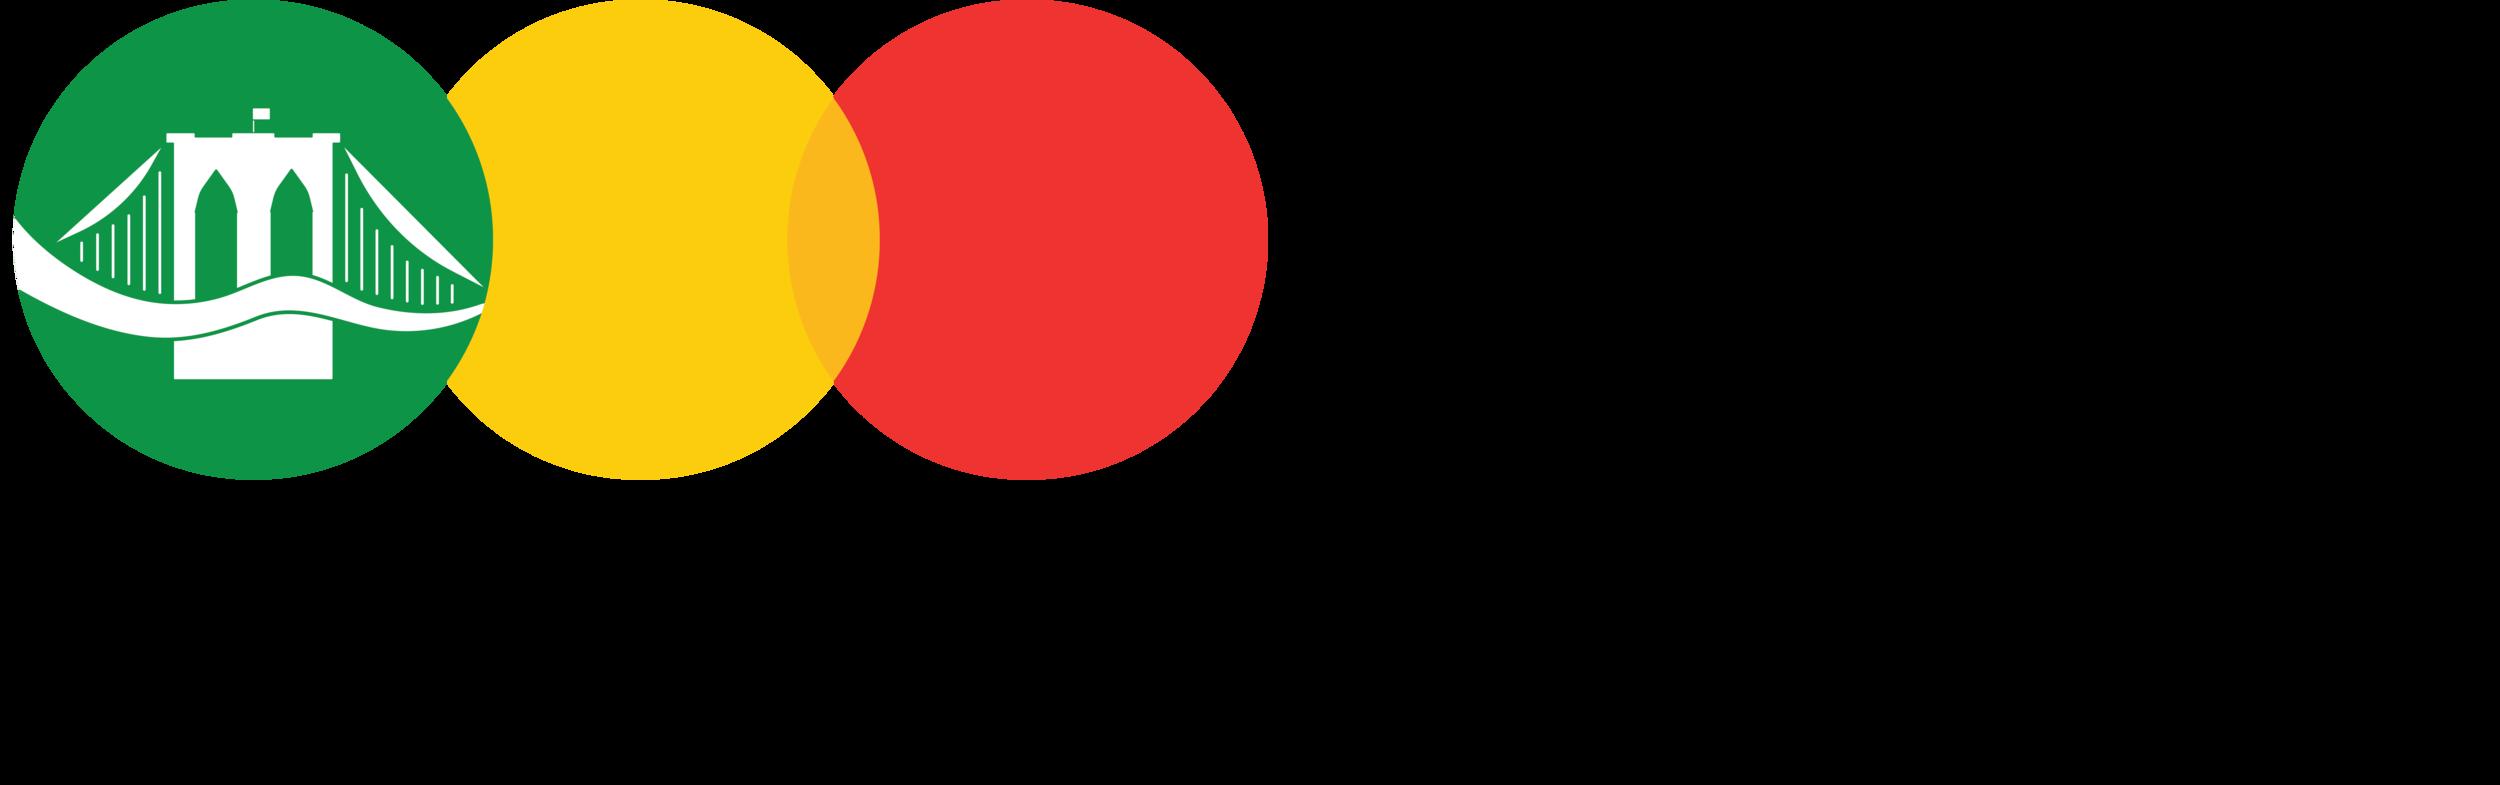 Full Logo PNG.png